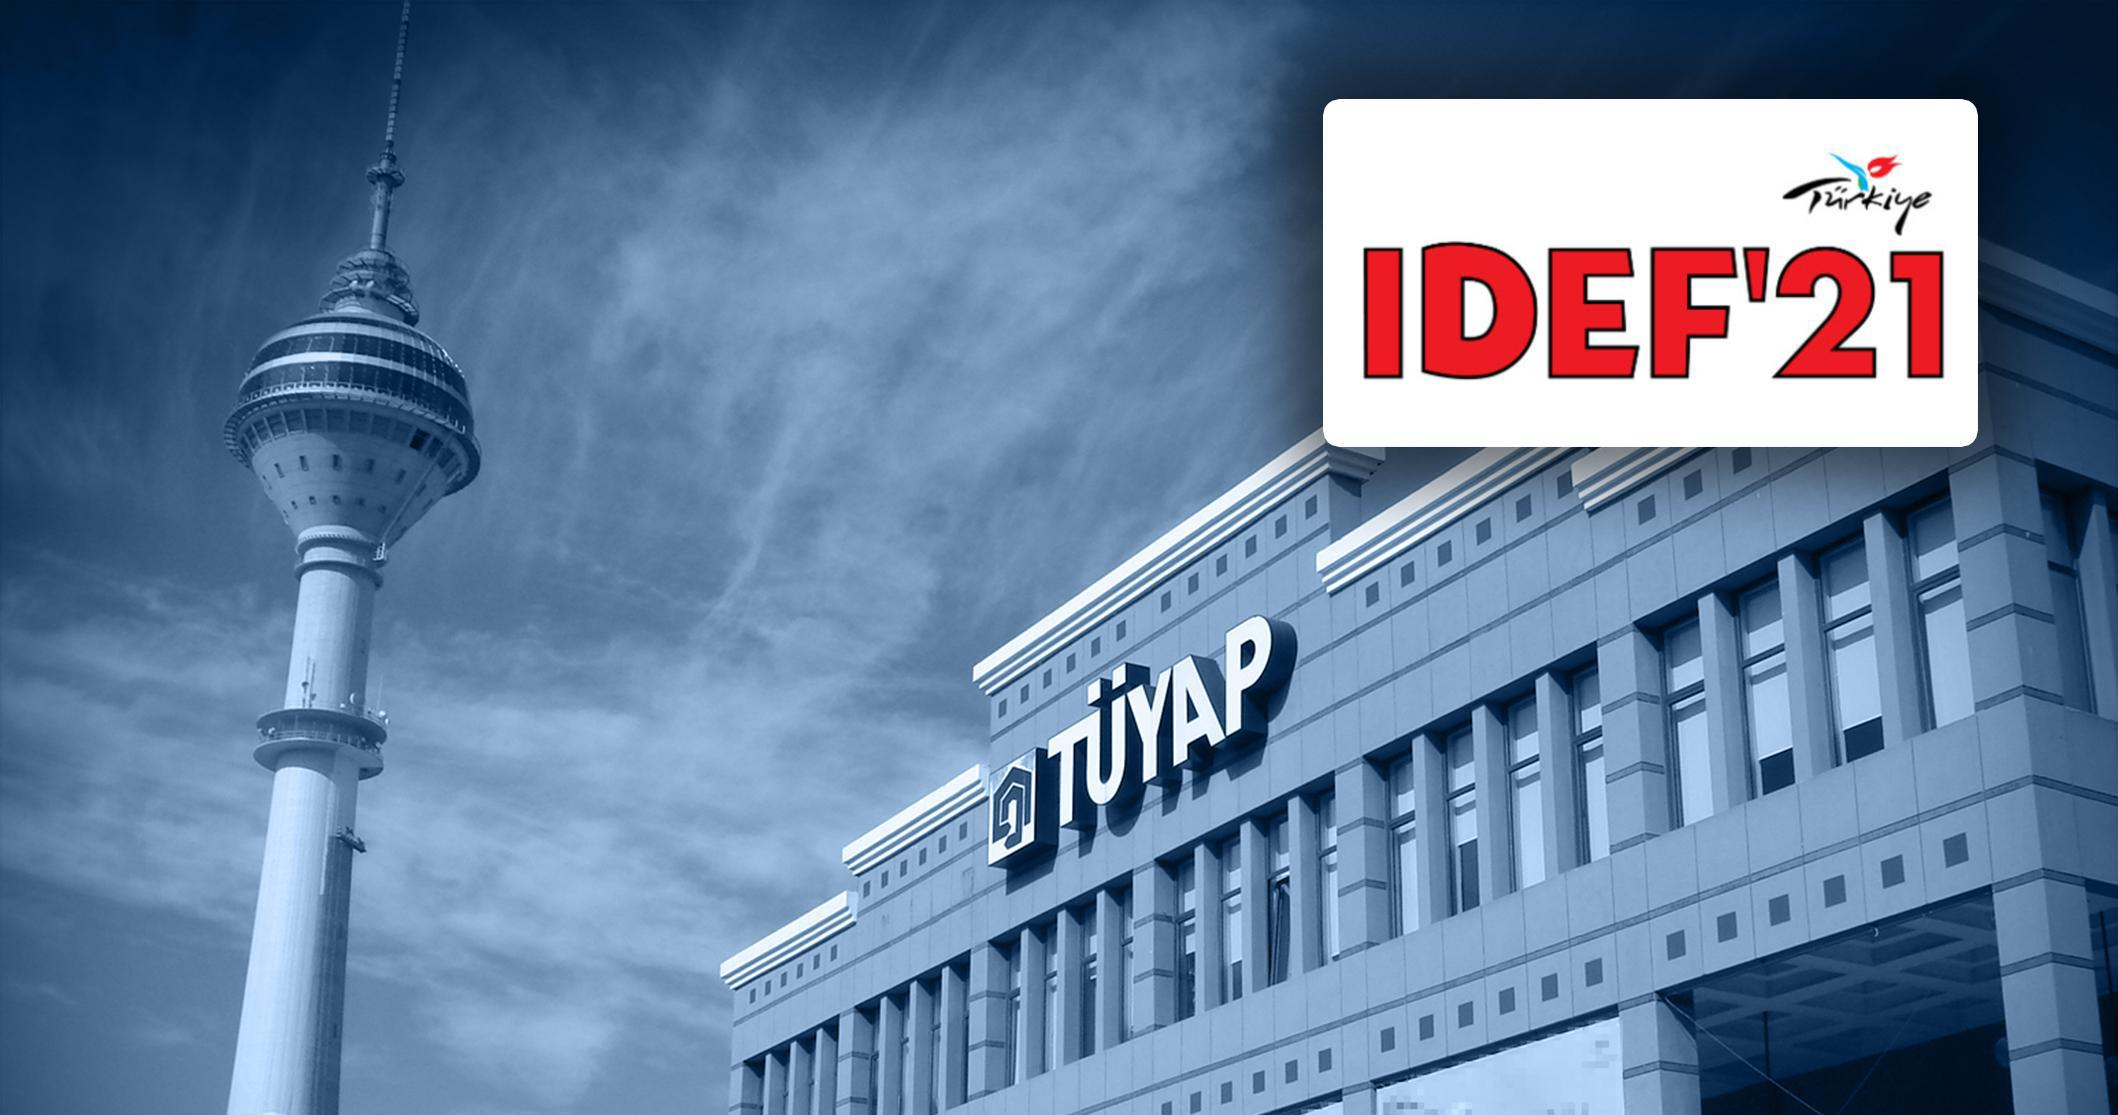 IDEF'21, 15th International Defence Industry Fair